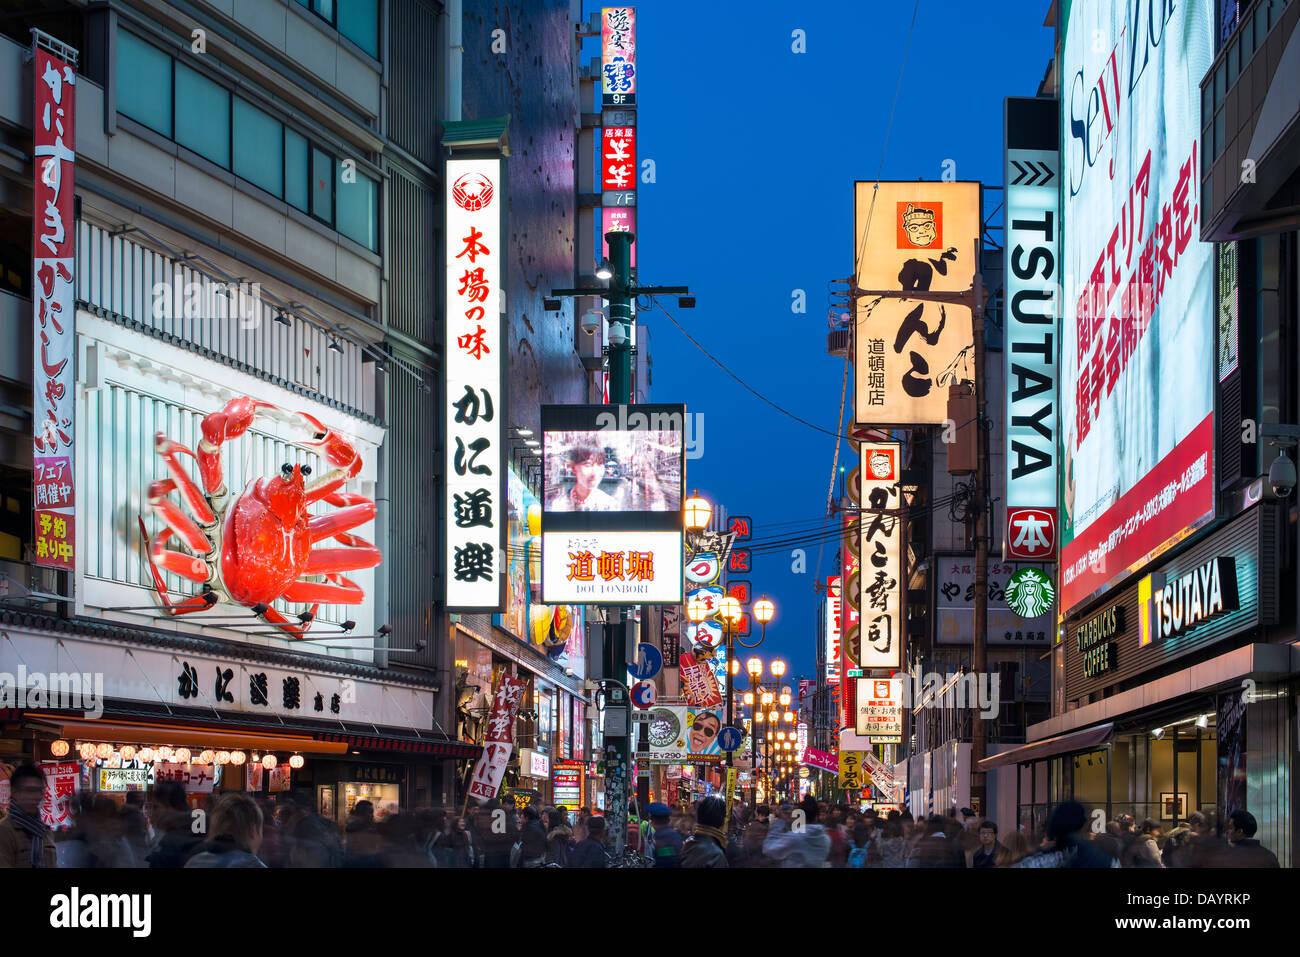 Dotonbori Nachtleben Bezirk von Osaka, Japan. Stockbild